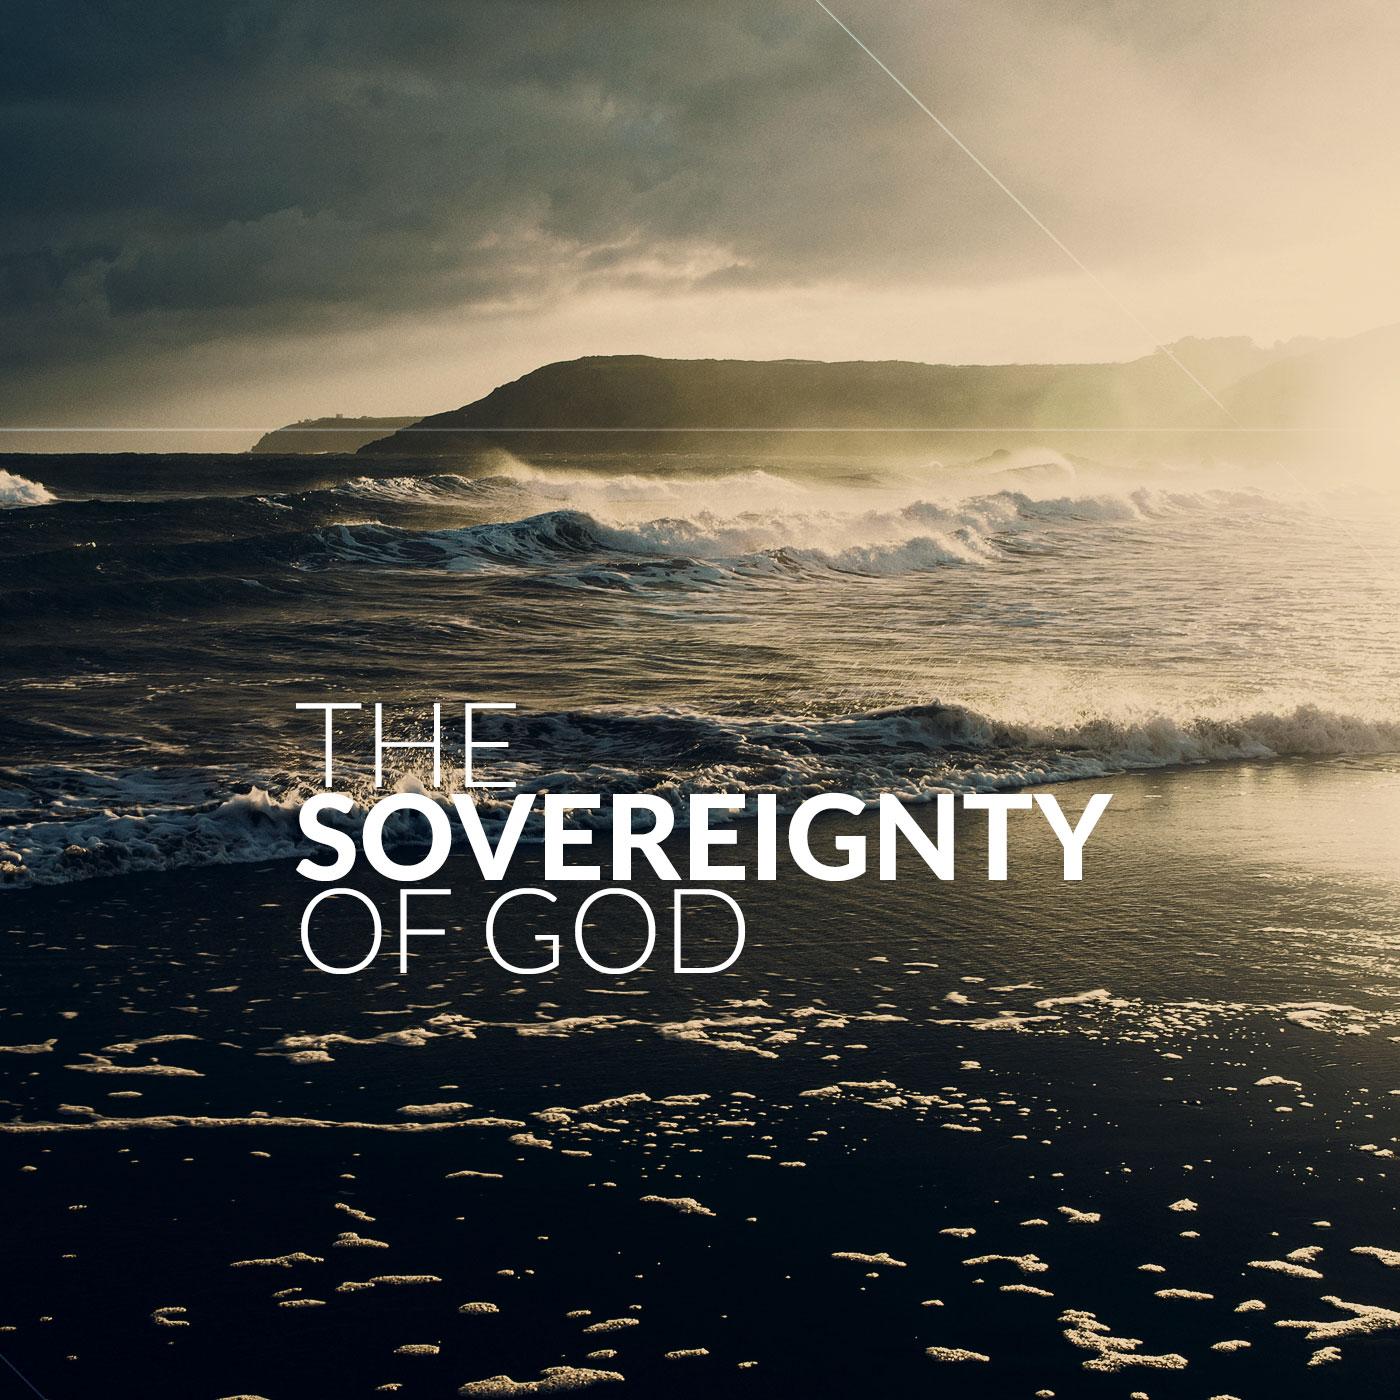 「sovereignty of God」的圖片搜尋結果